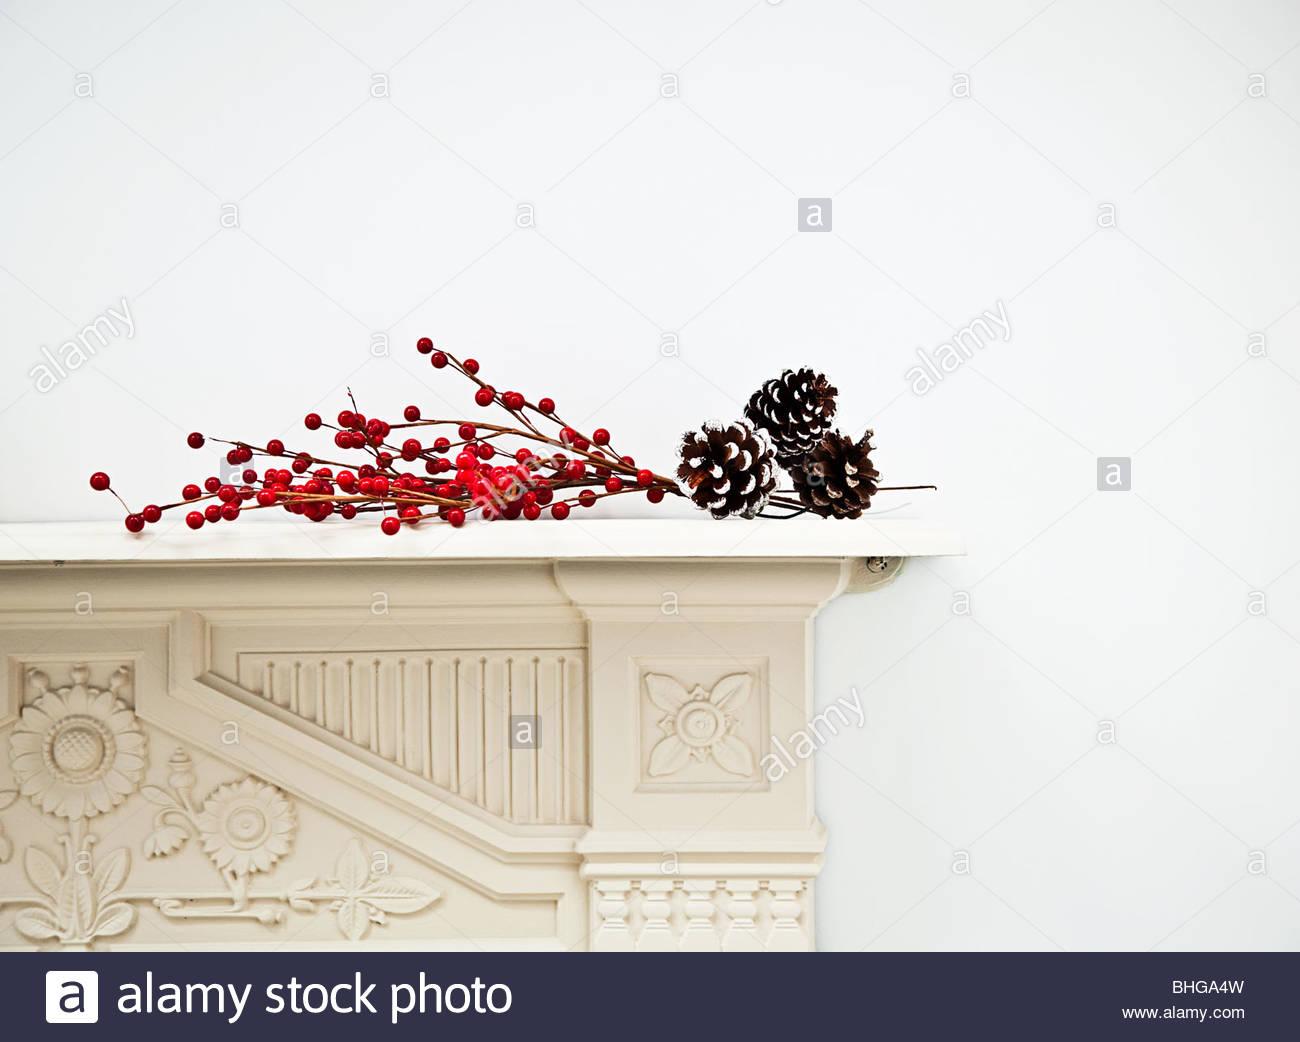 Decoración festiva en mantlepiece Imagen De Stock